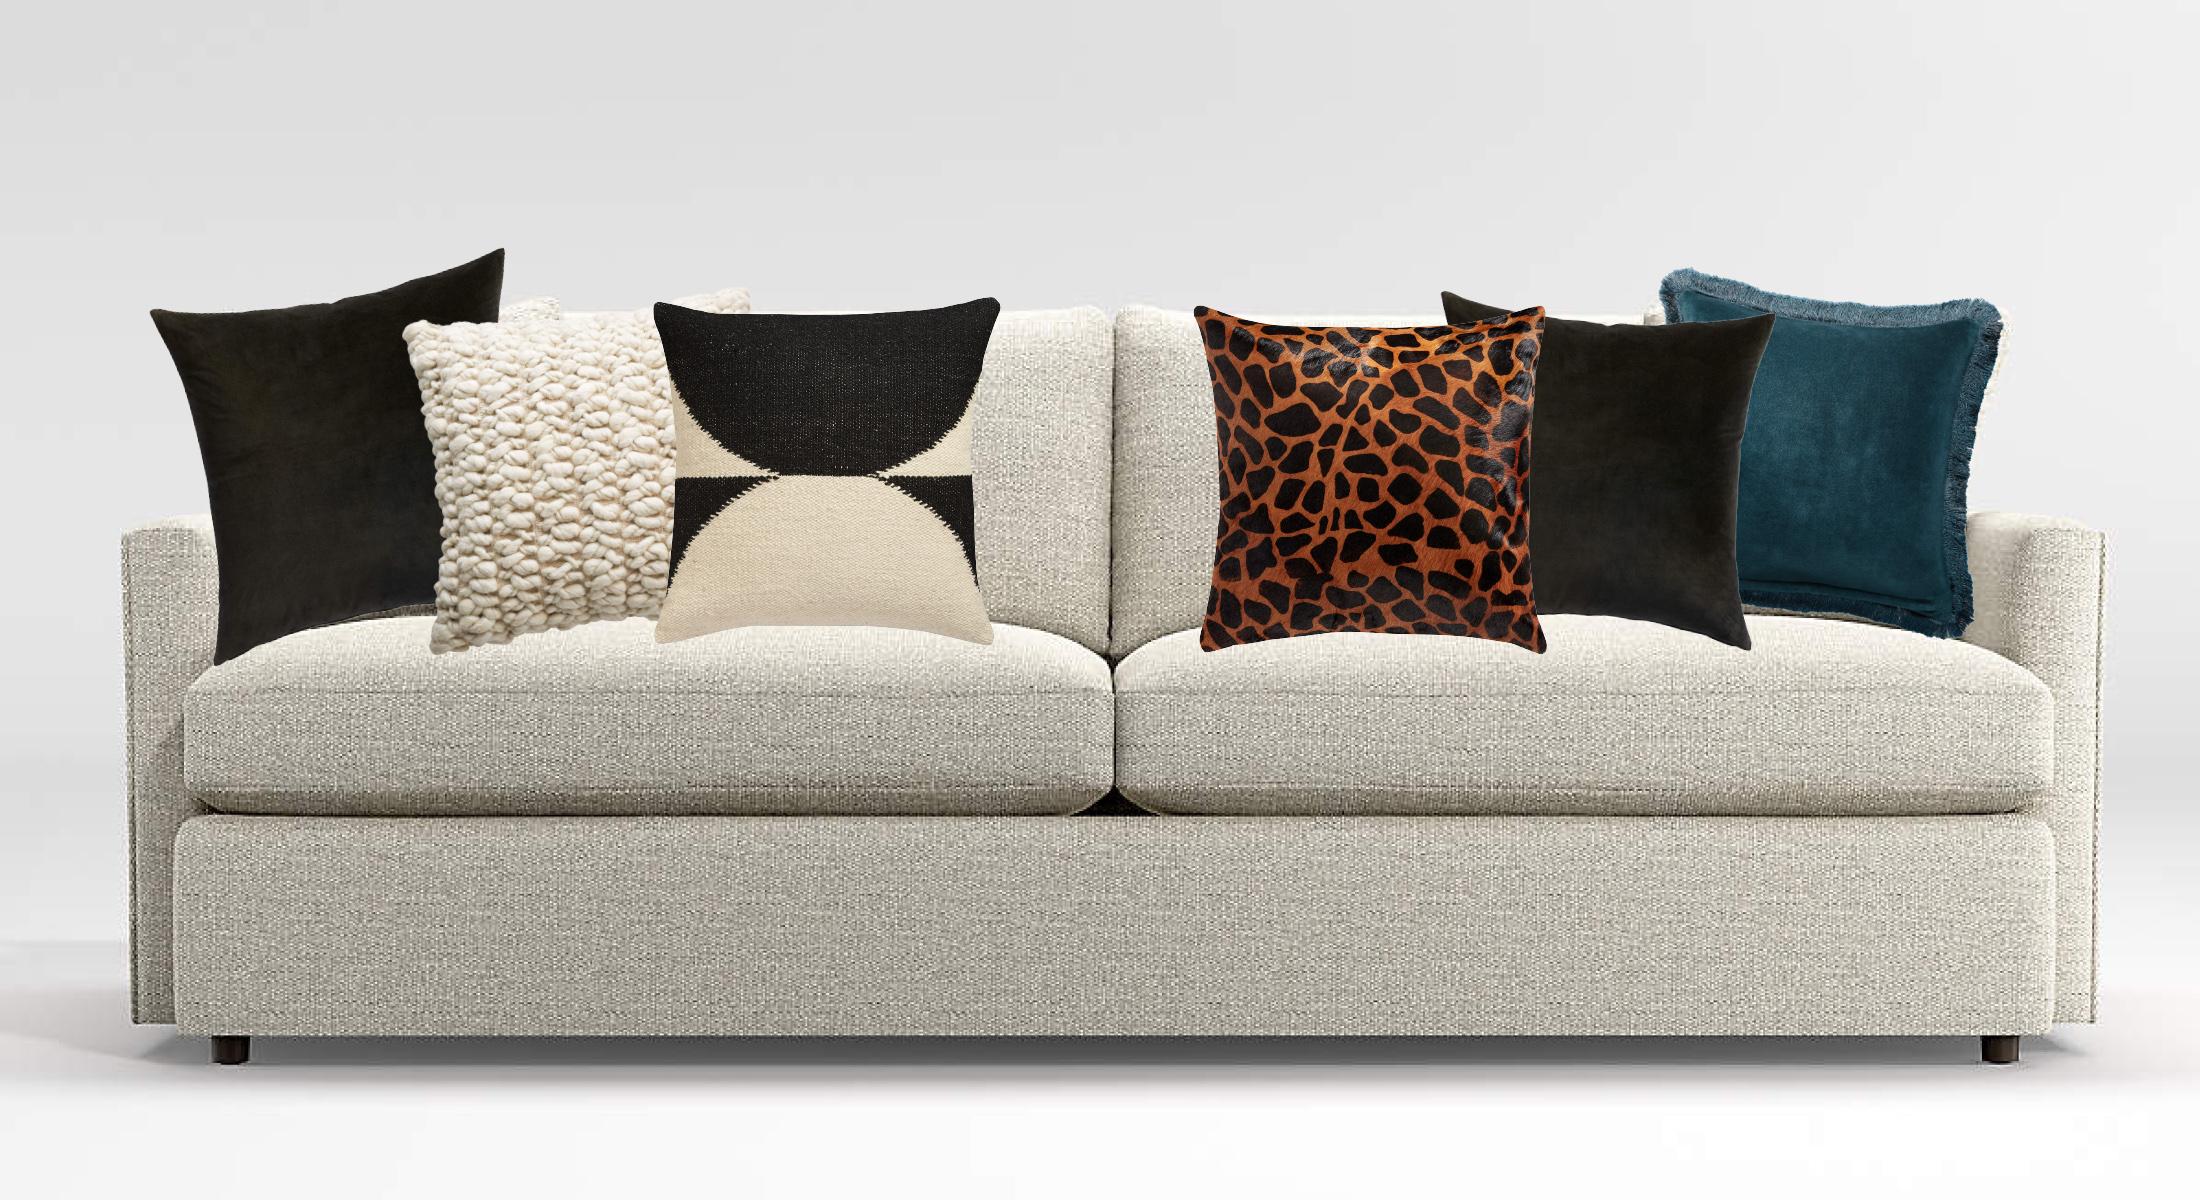 6 throw pillow ideas to refresh a grey